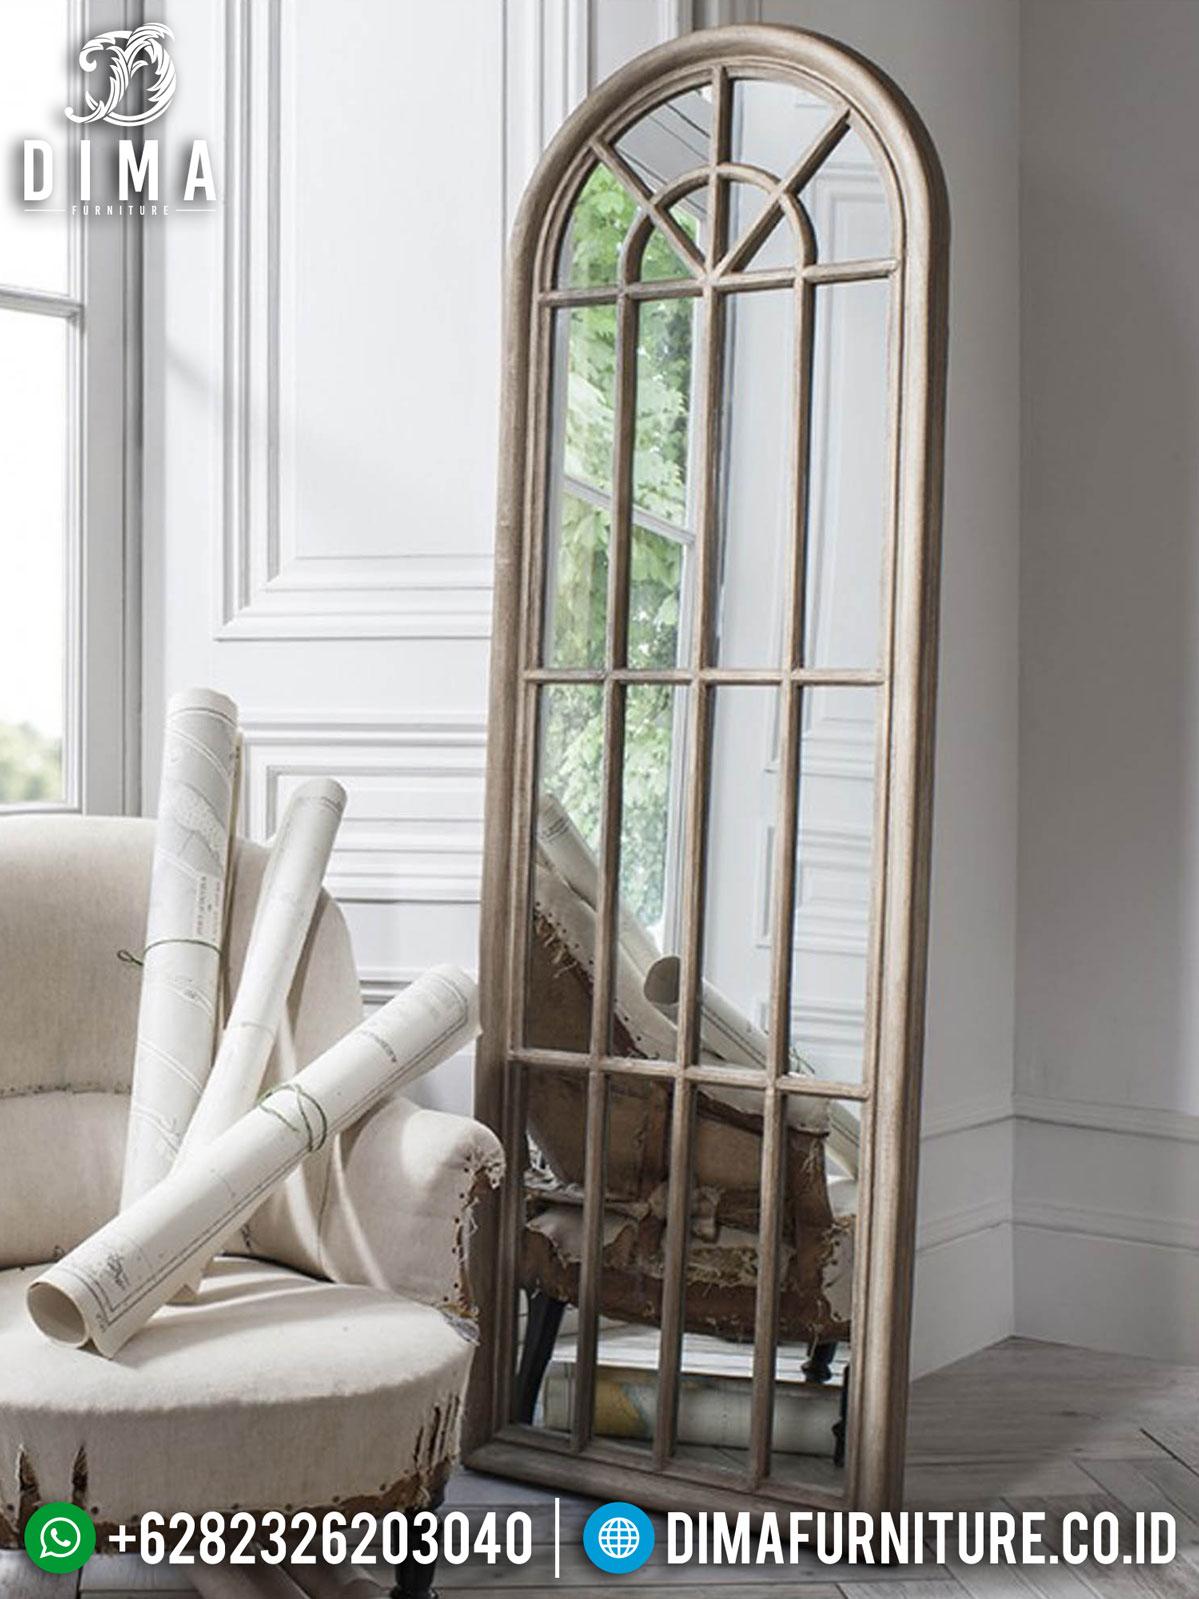 Cermin Hias Minimalis Design Inspiring Vanity Room Furniture Jepara Terbaru TTJ-1292